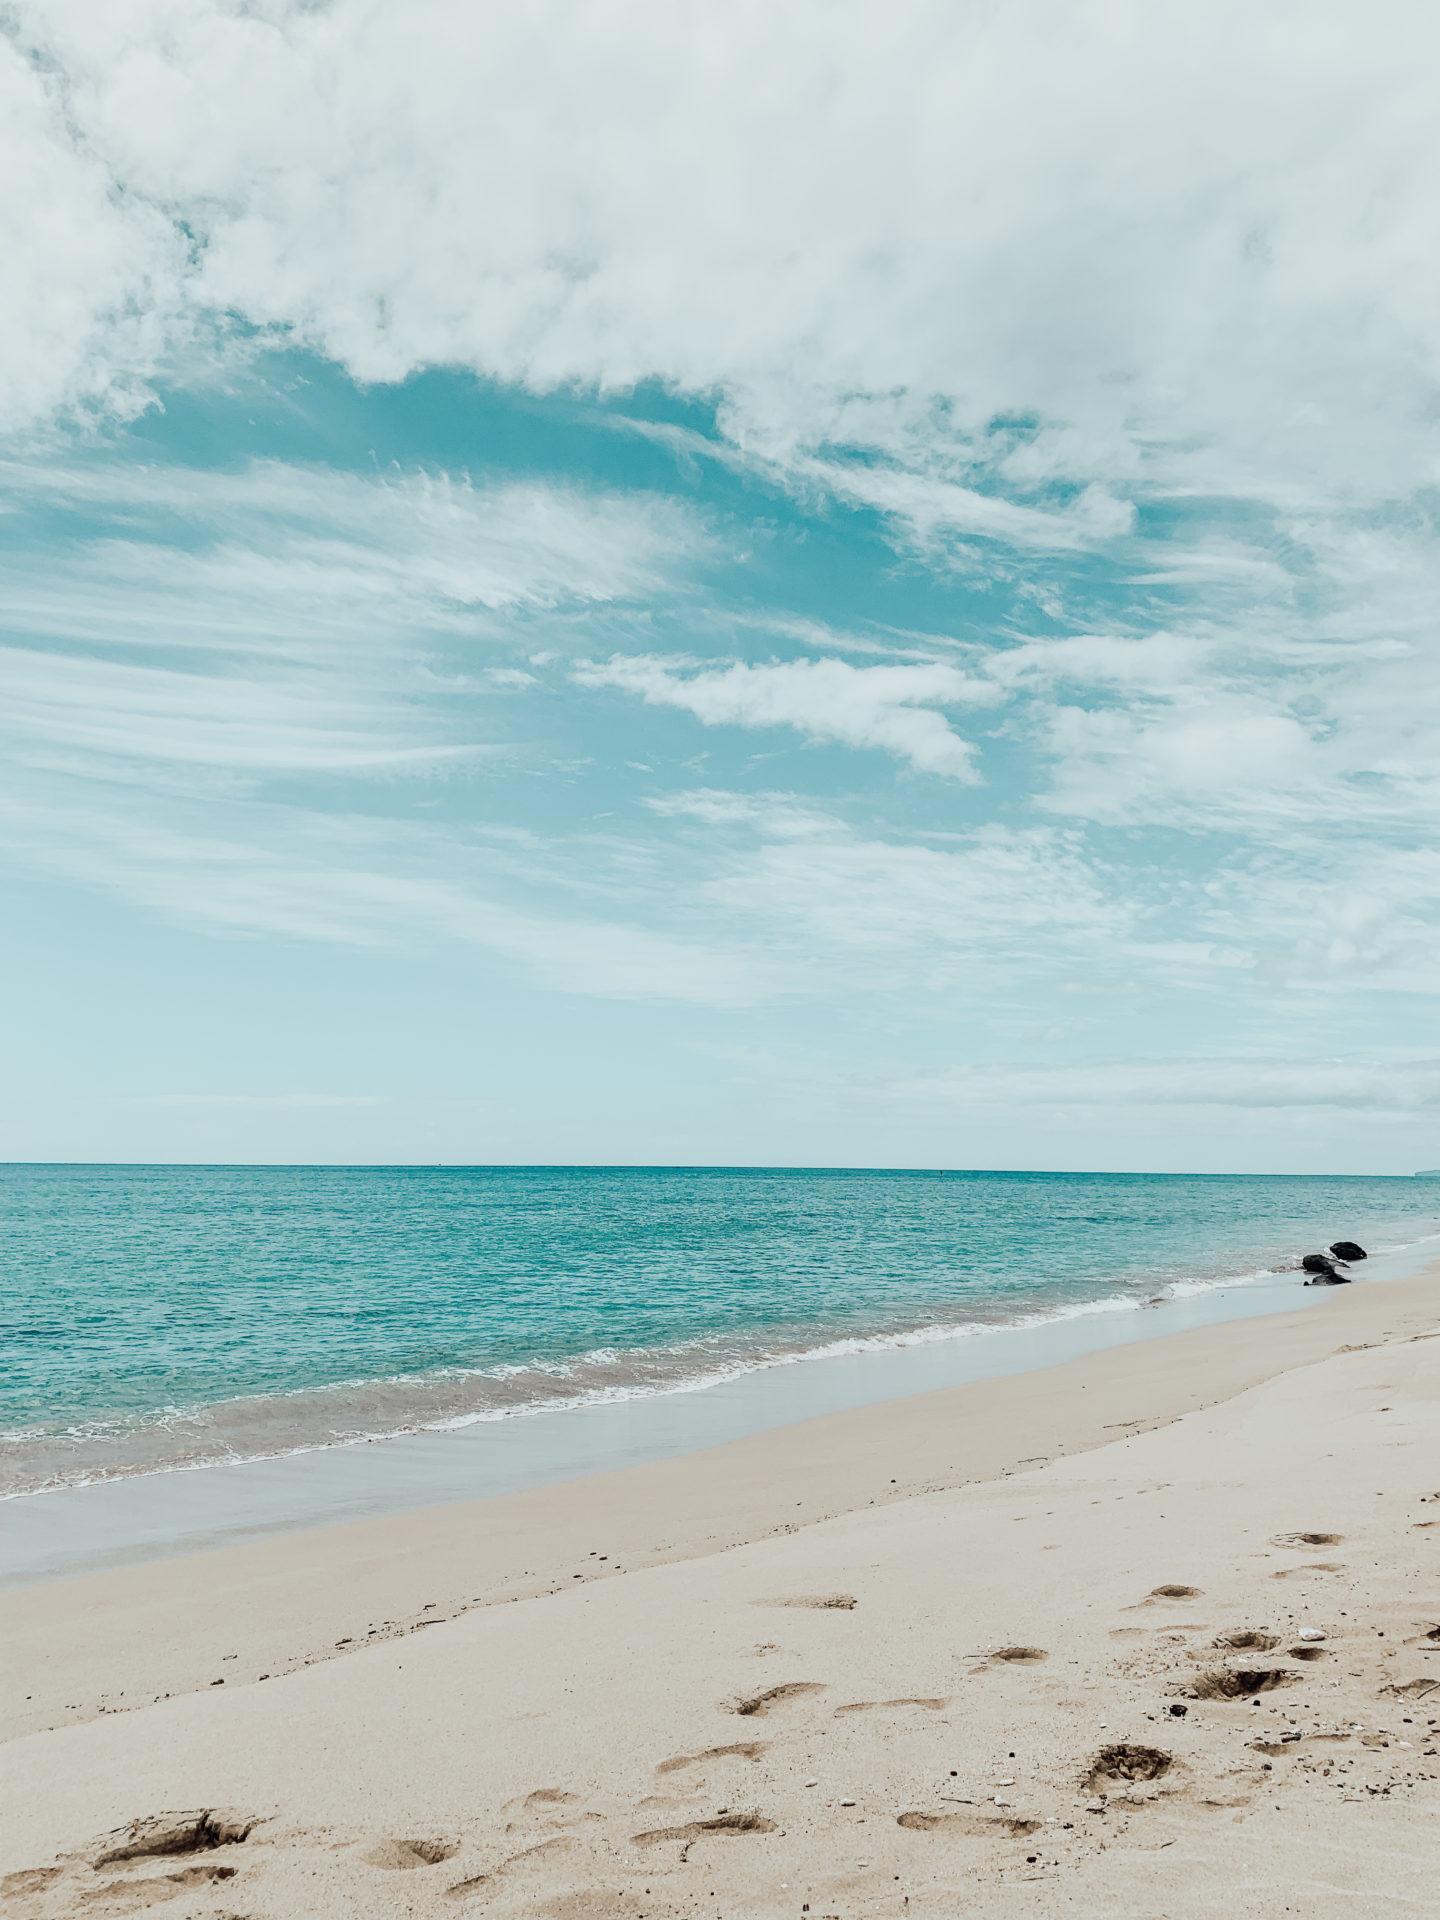 Travel Diary: Maui, Hawaii - Olowalu Deserted Beach - www.thecasualfree.com